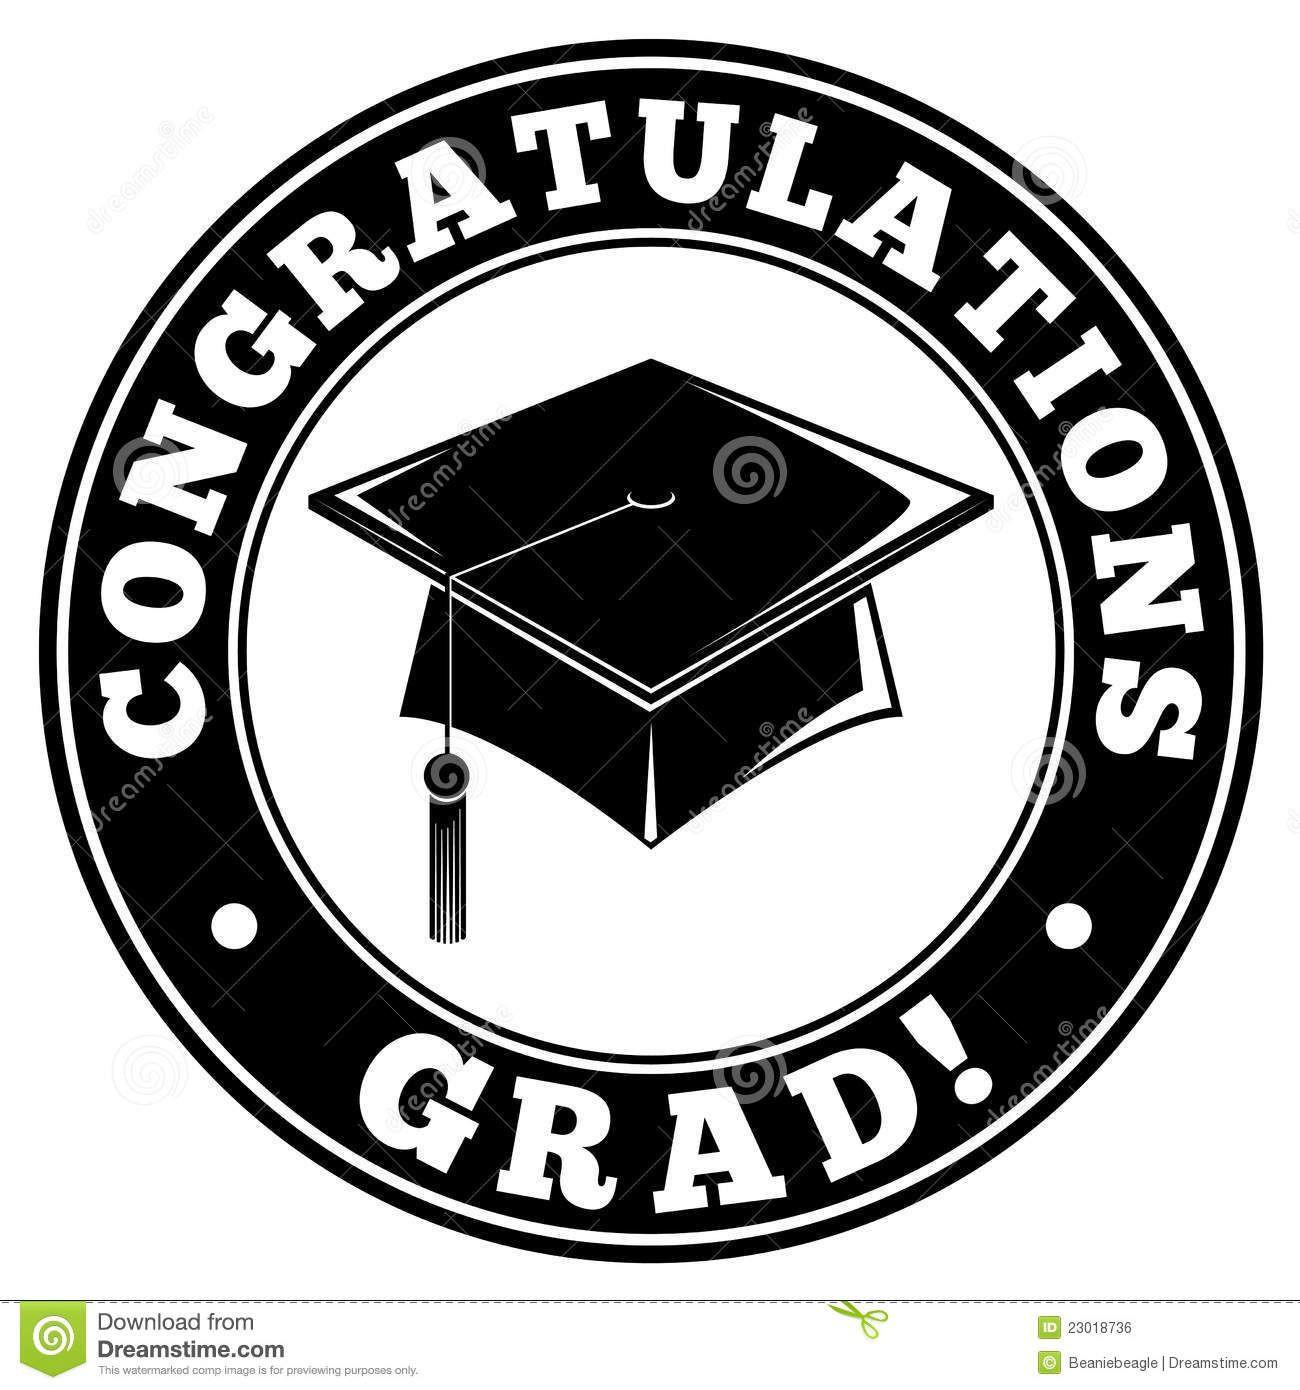 5795 Graduation free clipart.